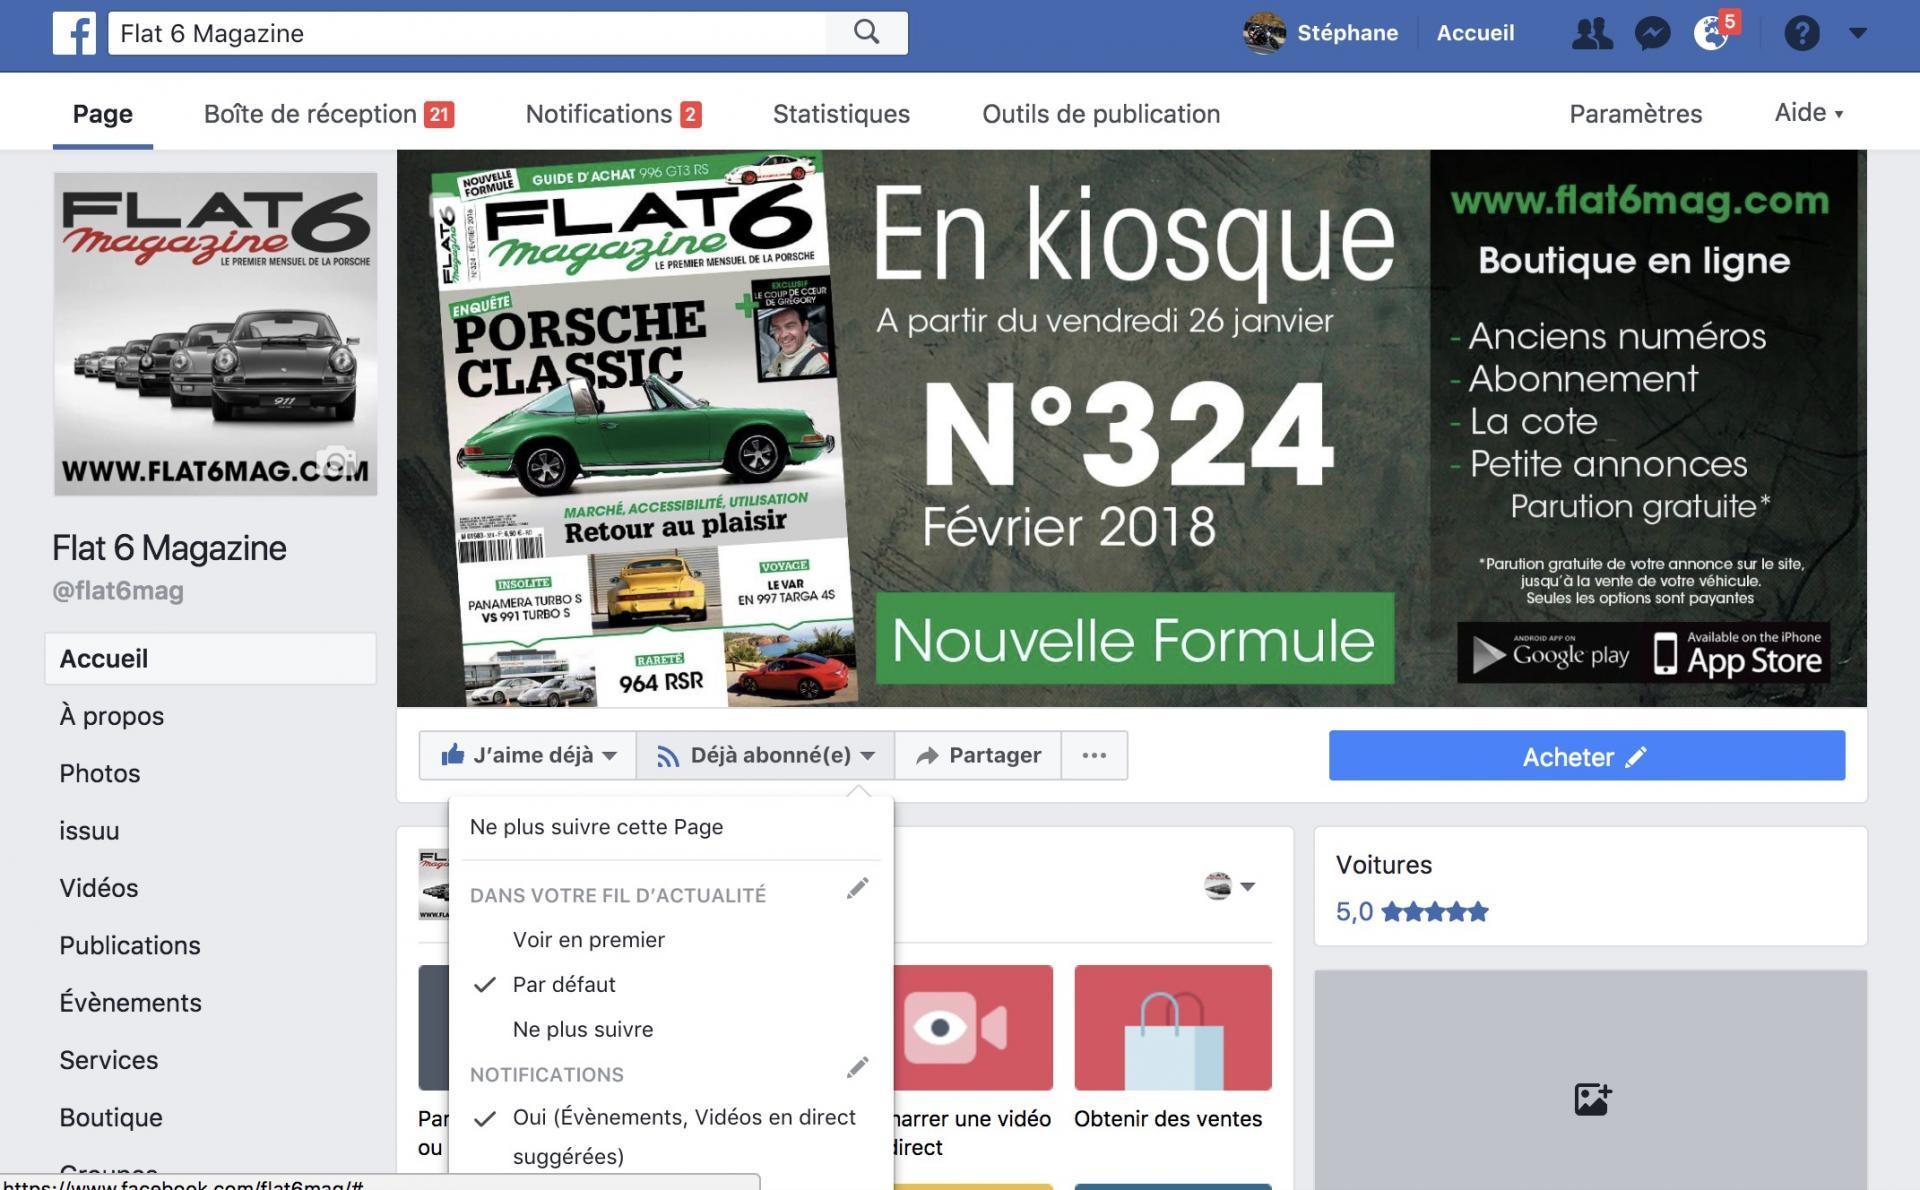 Facebook flat 6